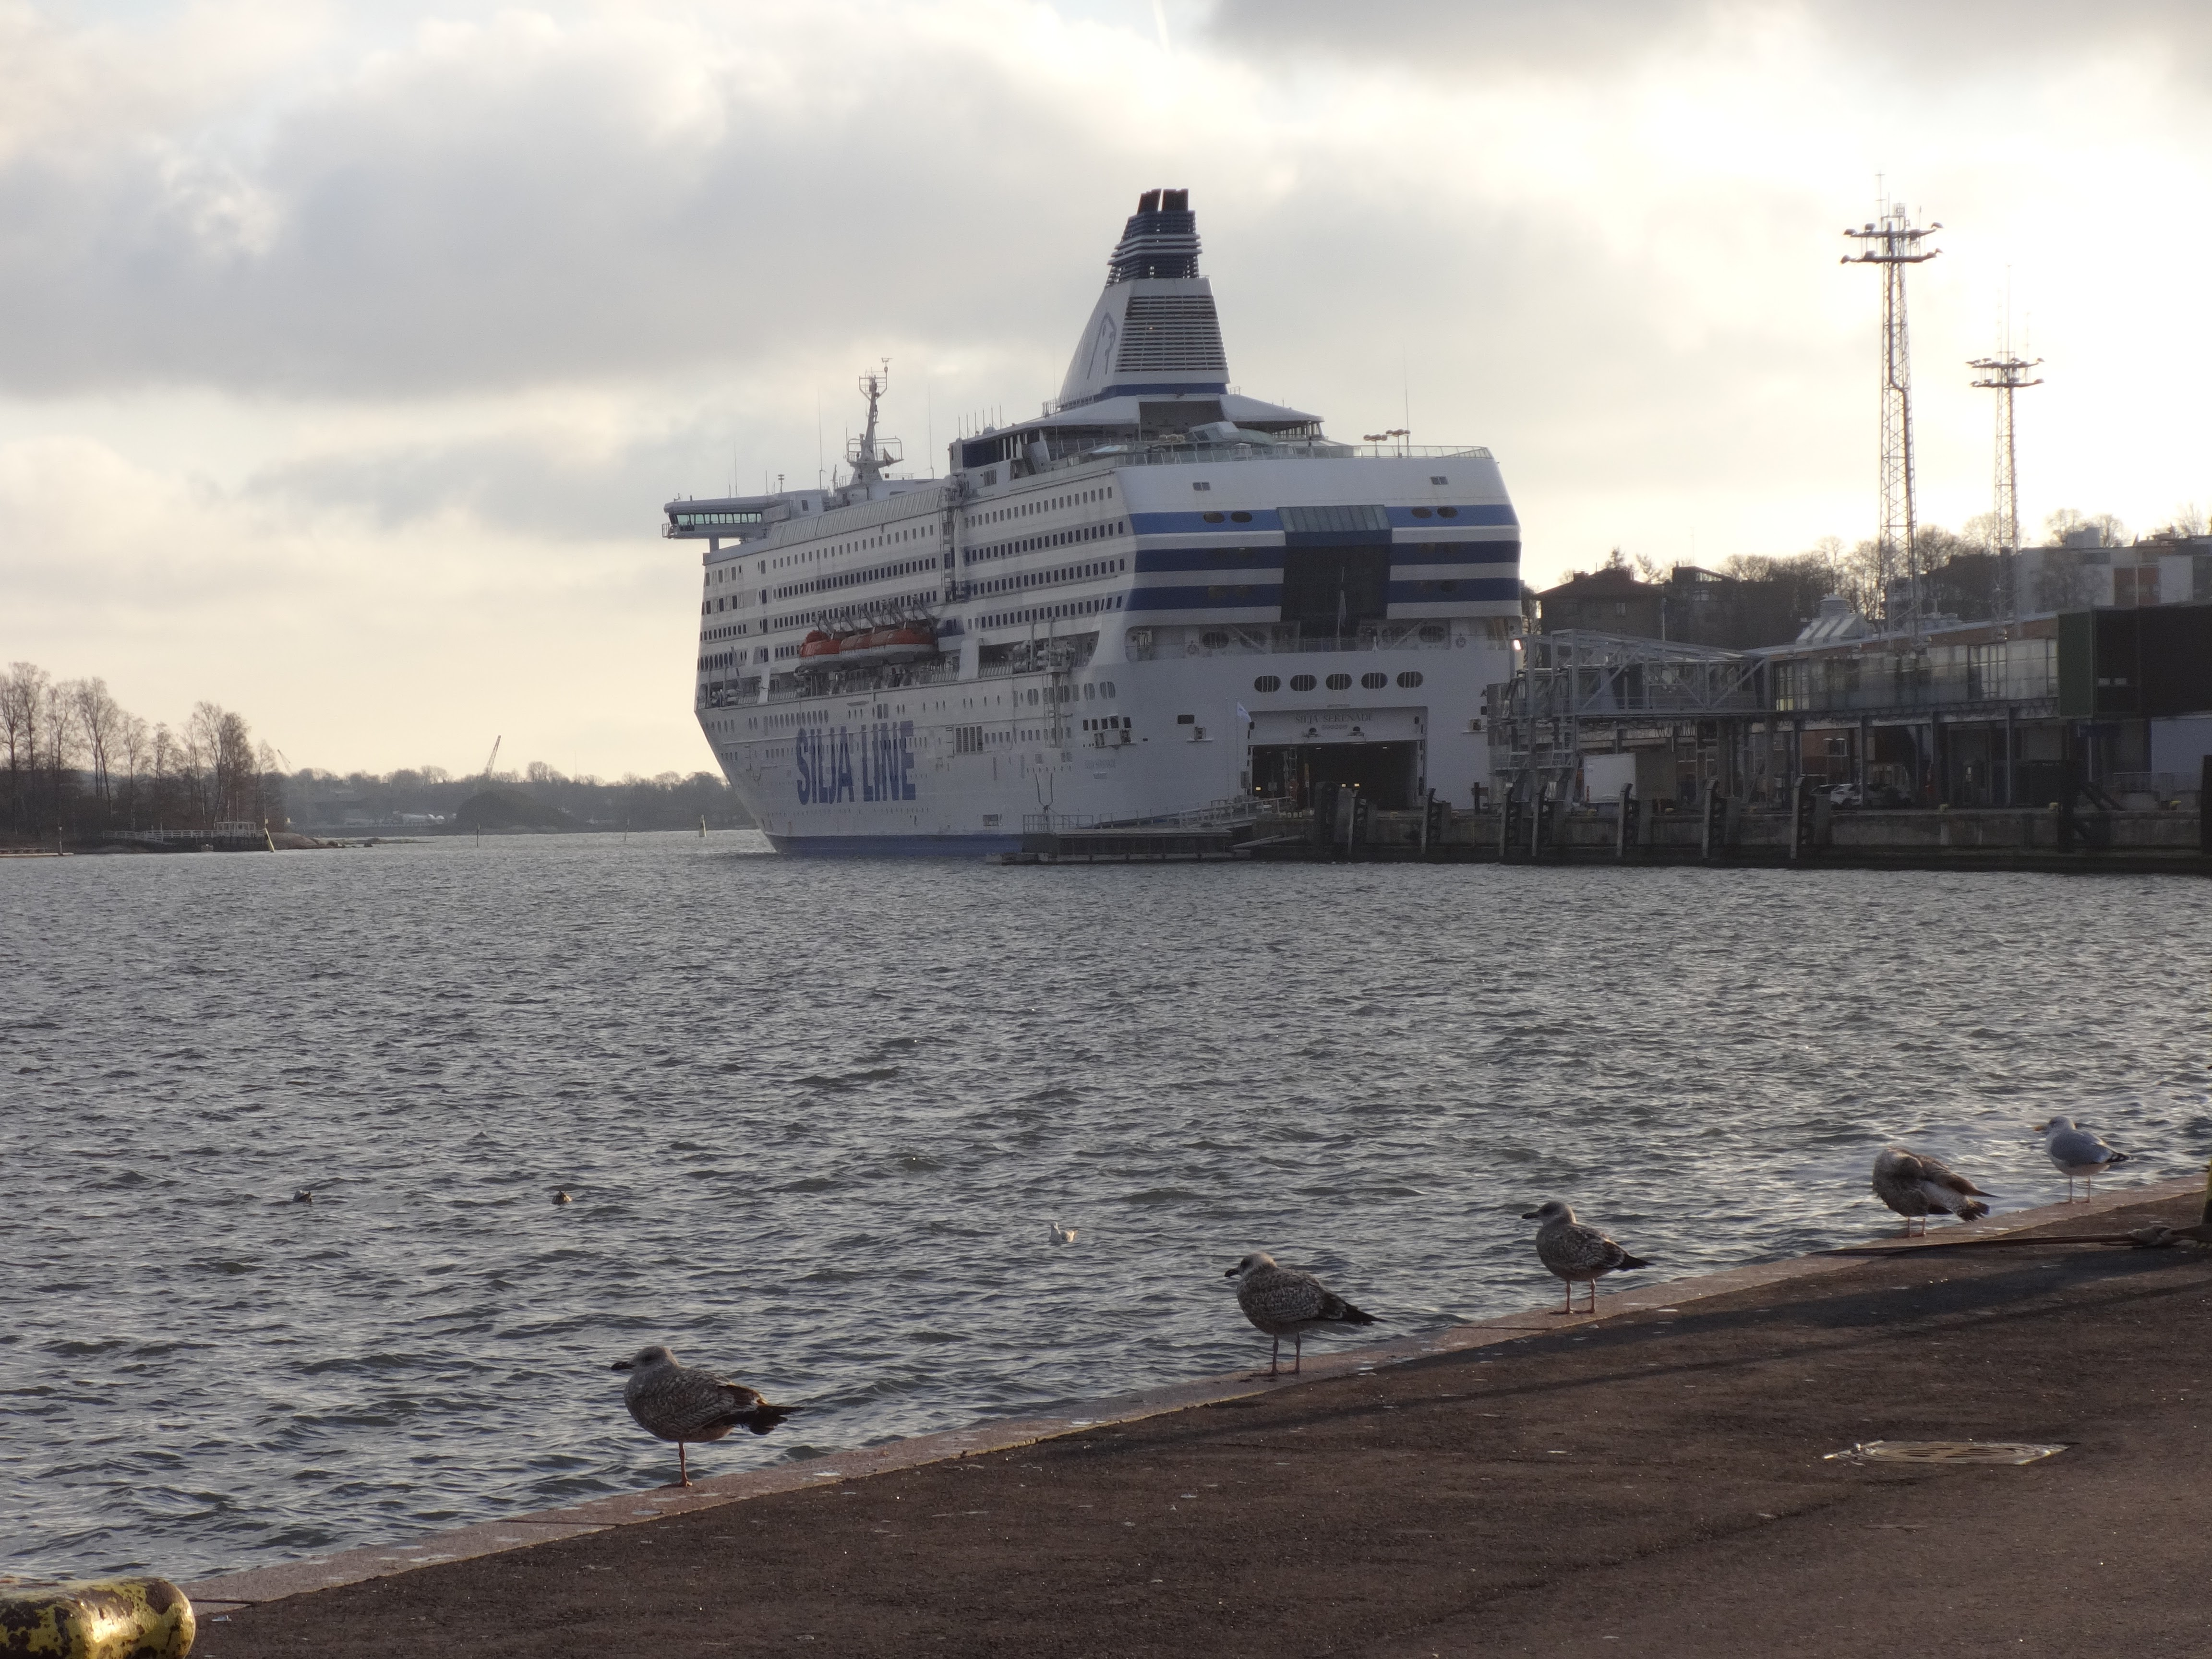 Silja Line and Birds View